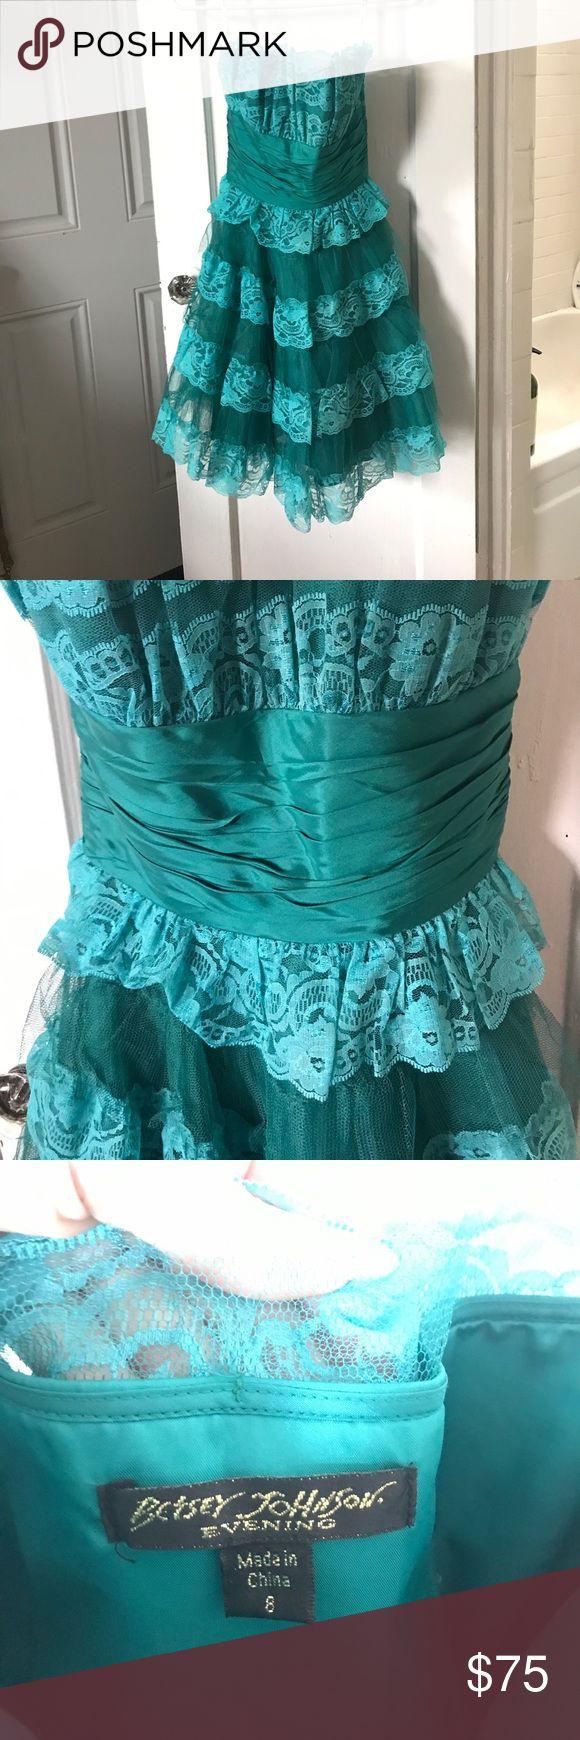 Betsey Johnson Tea Party Teal Dress | Dress images